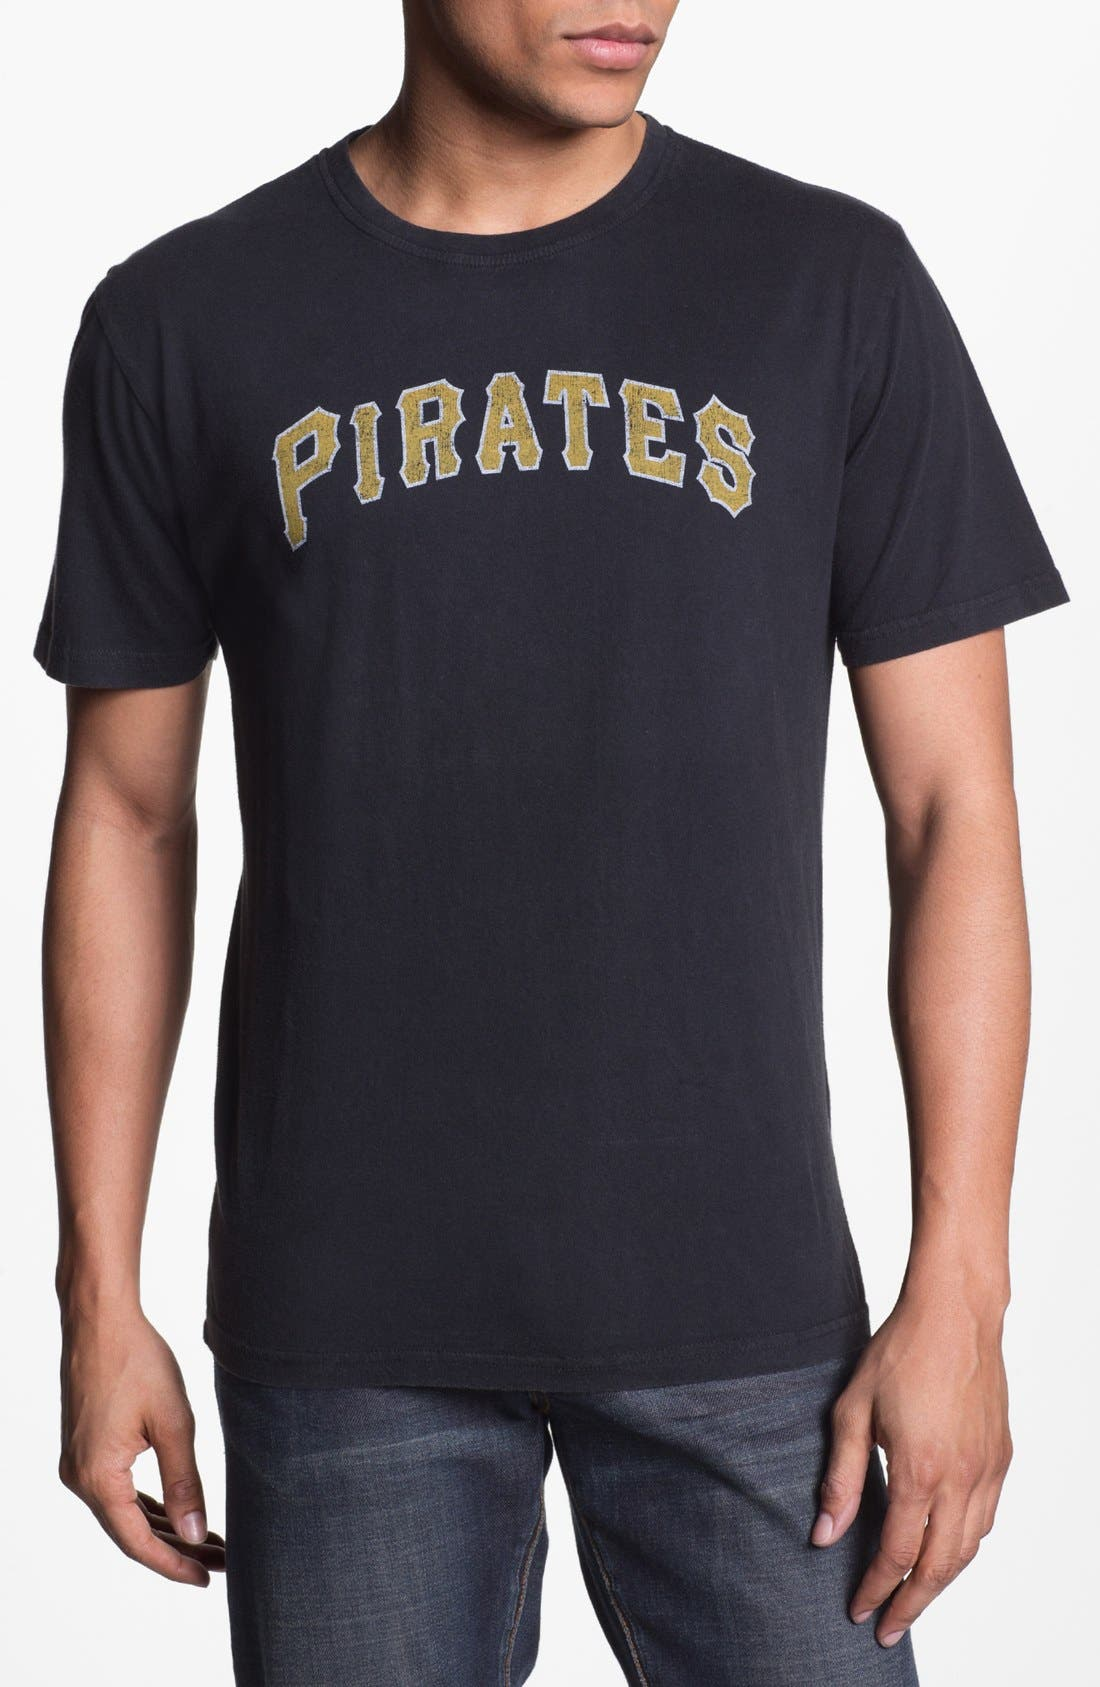 Main Image - Red Jacket 'Pirates - Brass Tack' T-Shirt